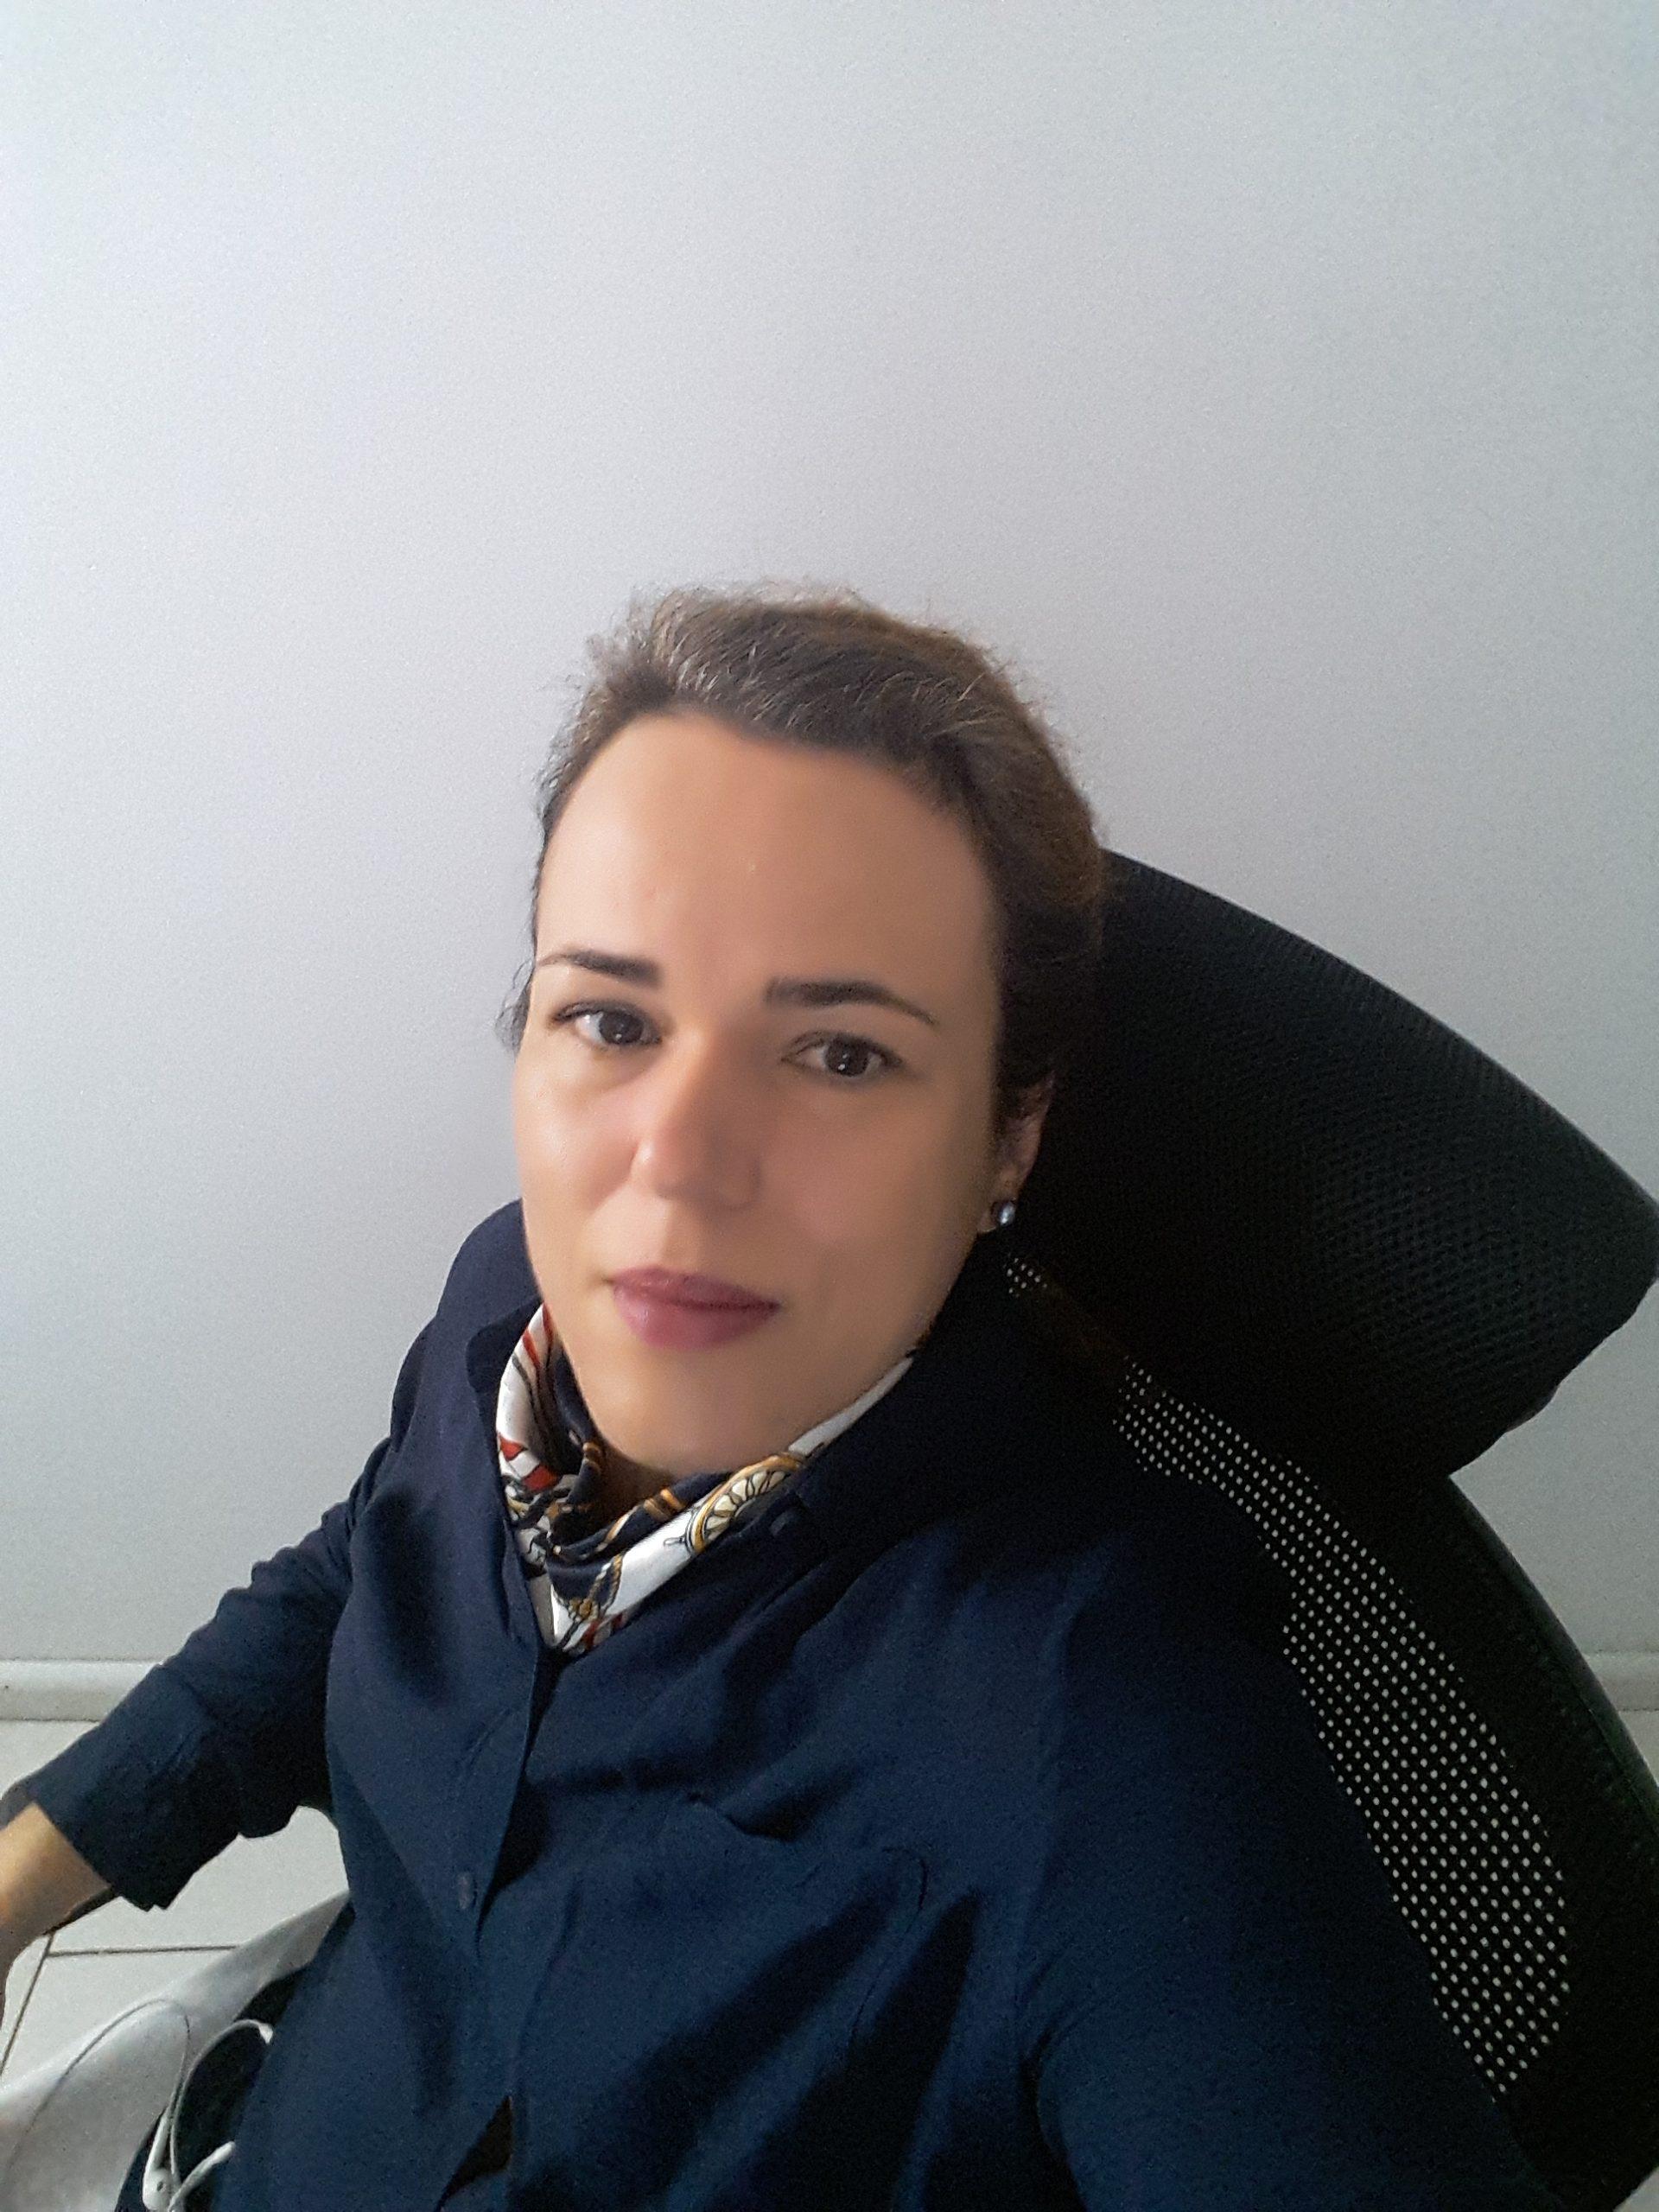 Raquel Souto